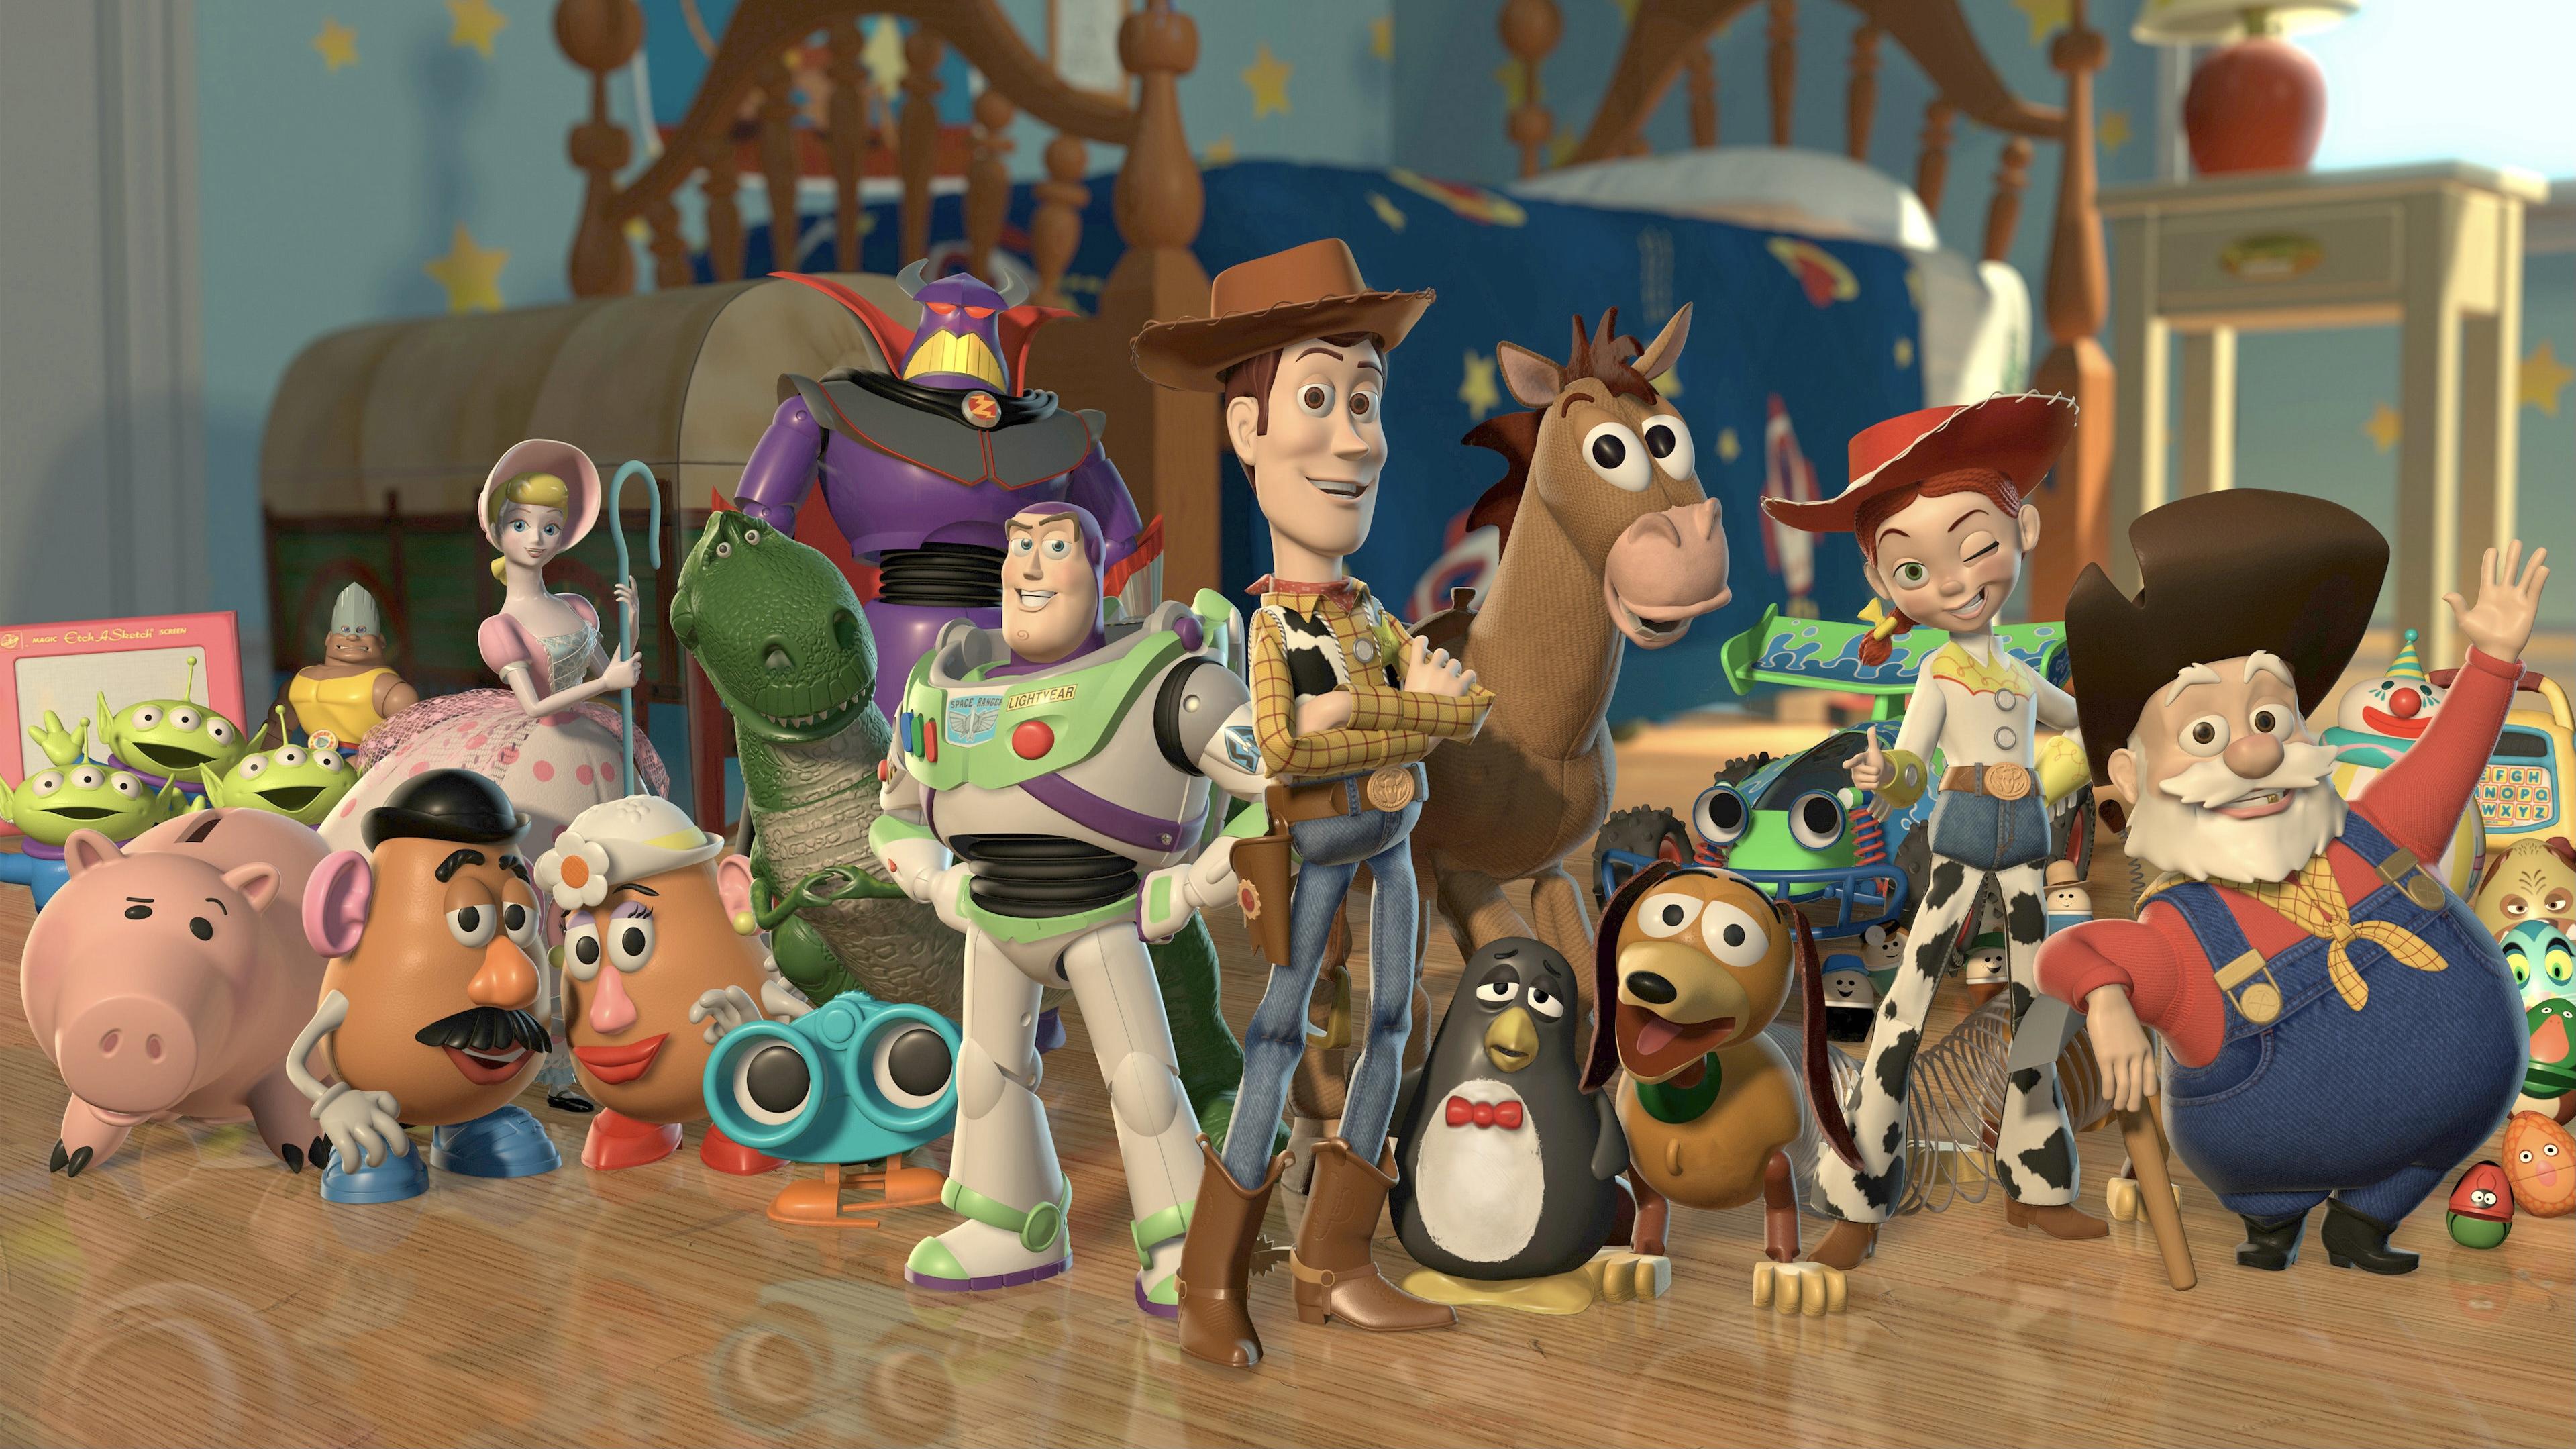 Toy Story 2 Characters Desktop Wallpaper 3840x2400